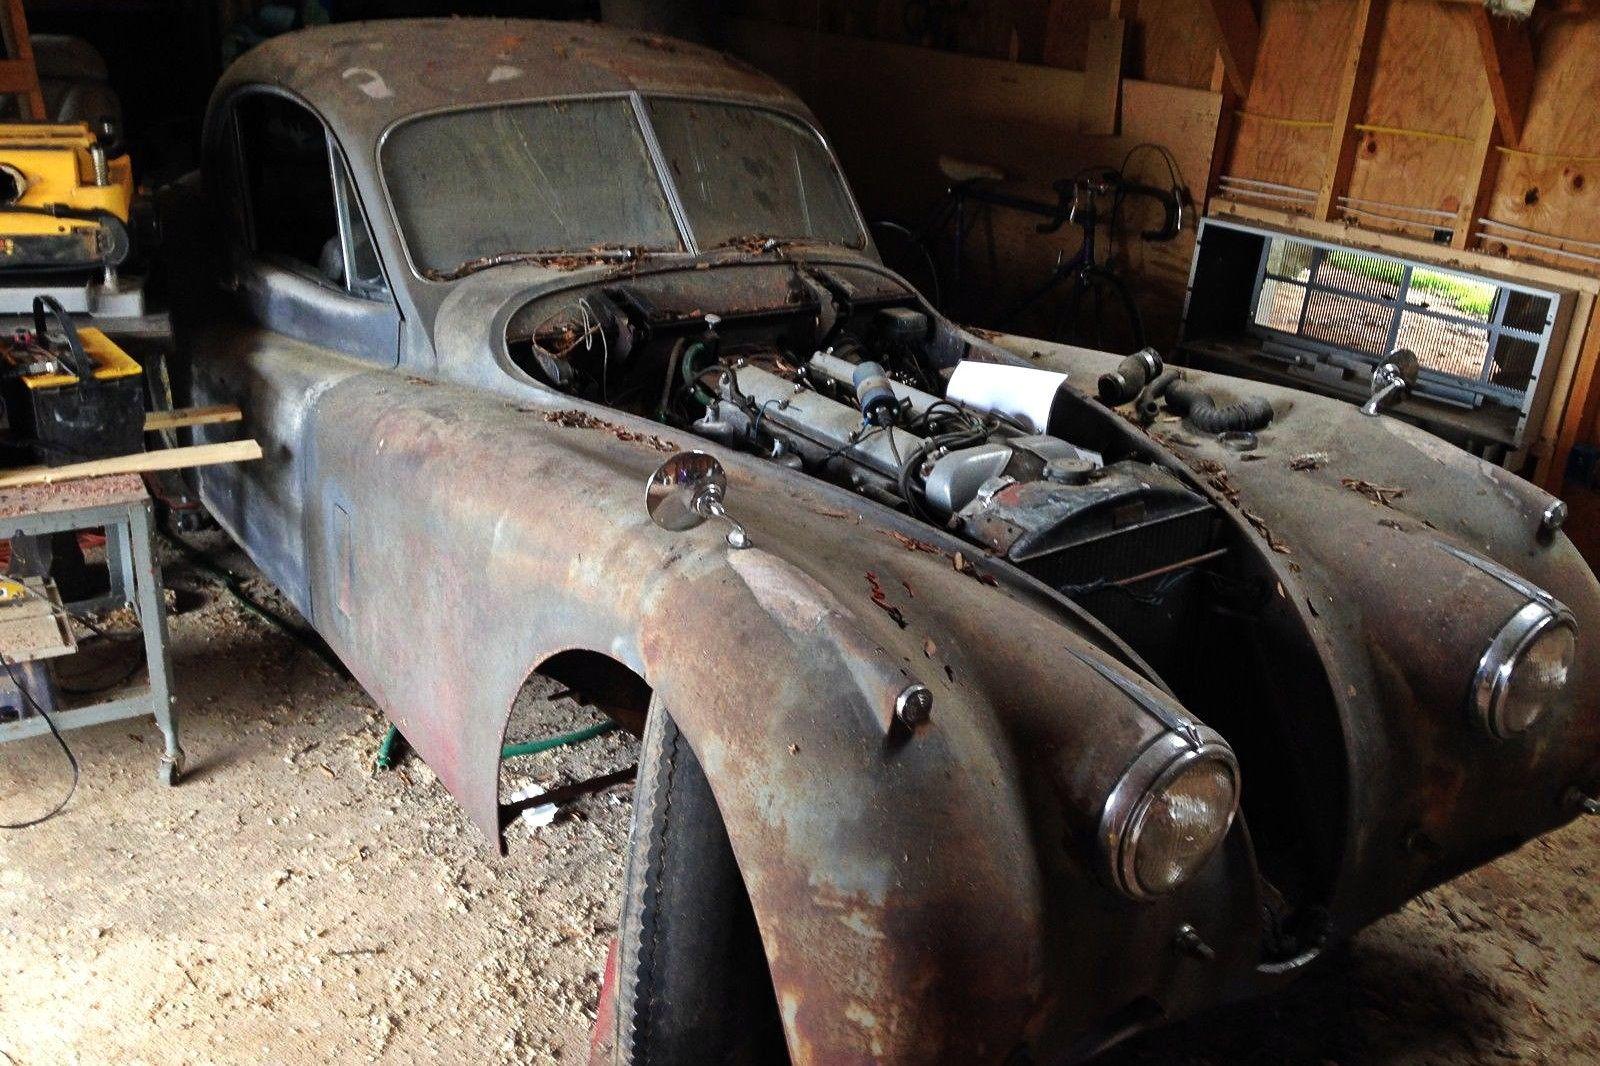 Still Runs: 1951 Jaguar XK120 Coupe | Barn finds, Jaguar xk120 and ...